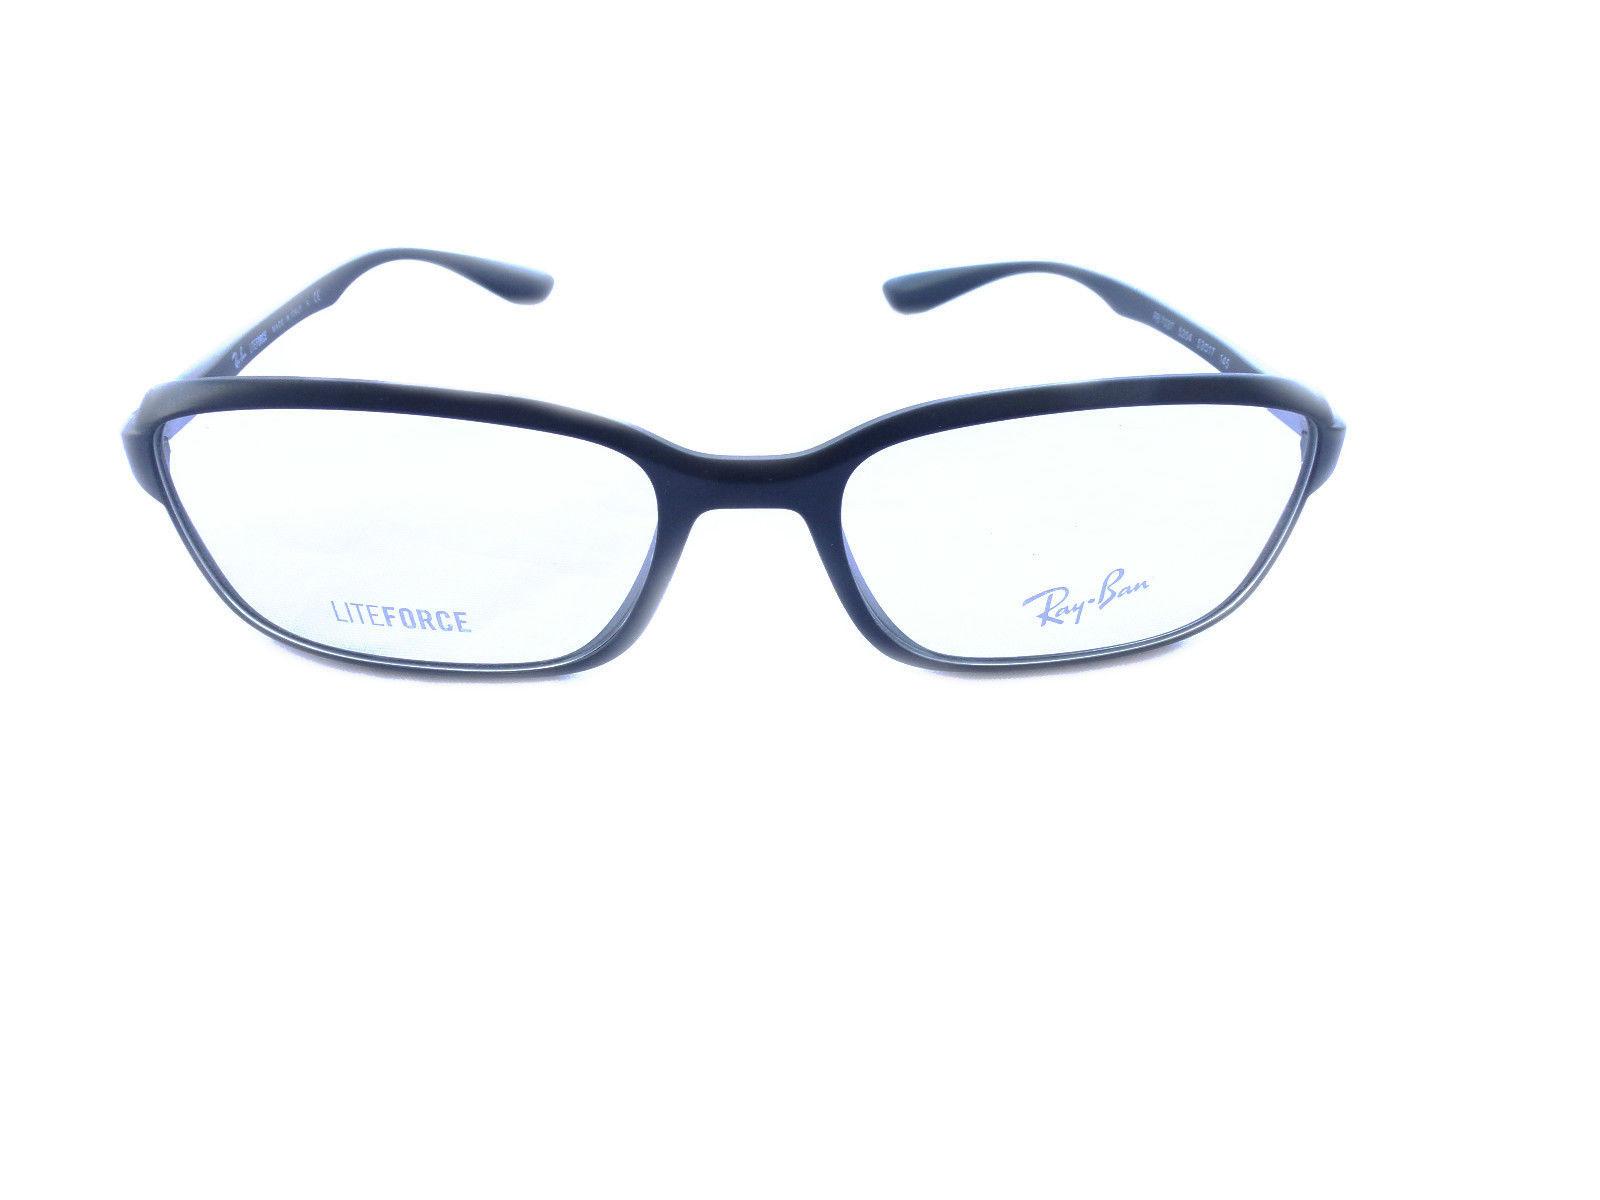 Ray-Ban reading glasses Lightforce and similar items